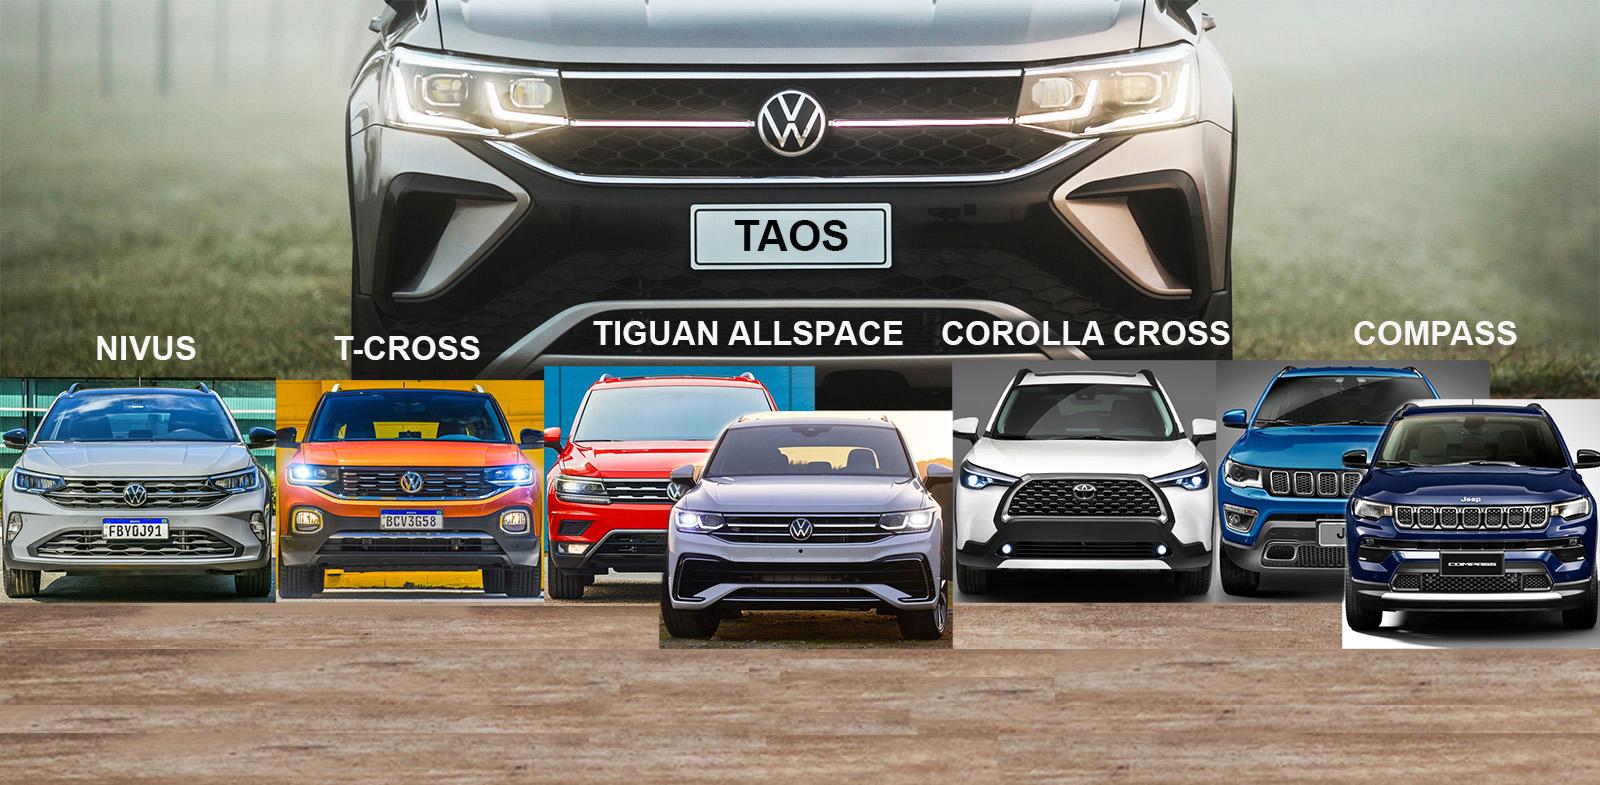 Taos vs. Nivus, T-Cross, Tiguan, Compass y Corolla Cross